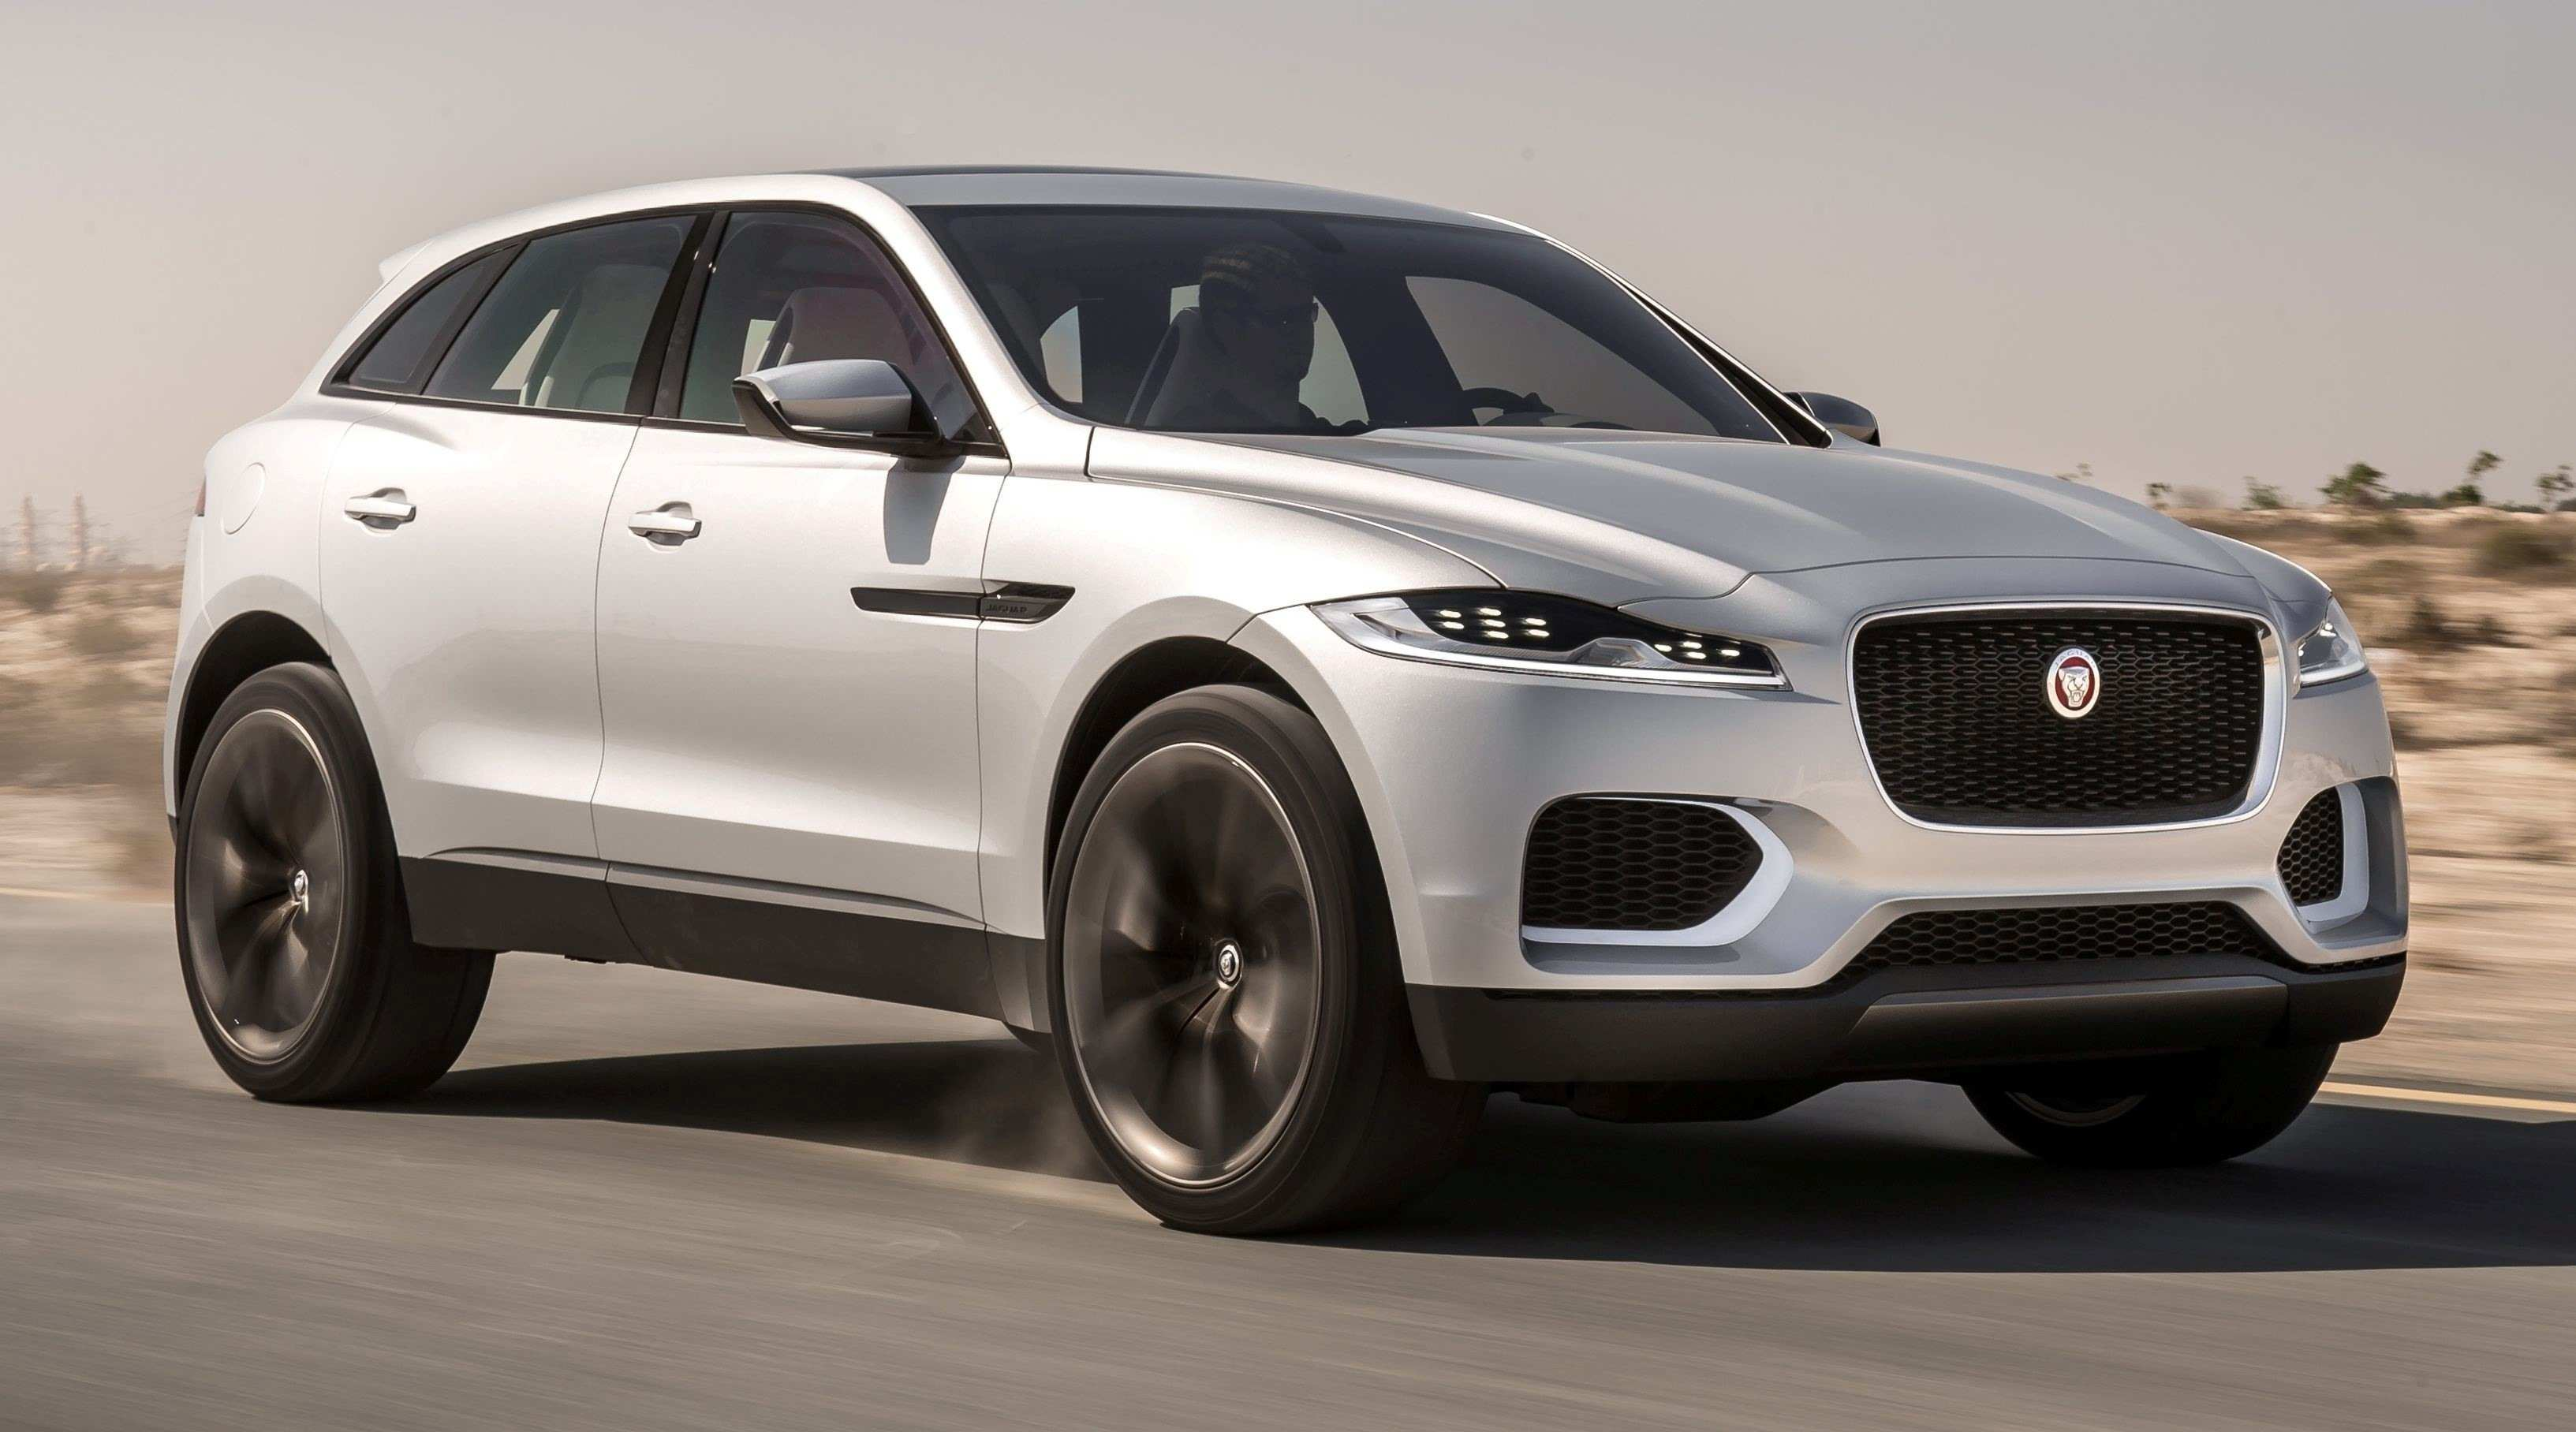 2020 jaguar xq crossover - car review : car review